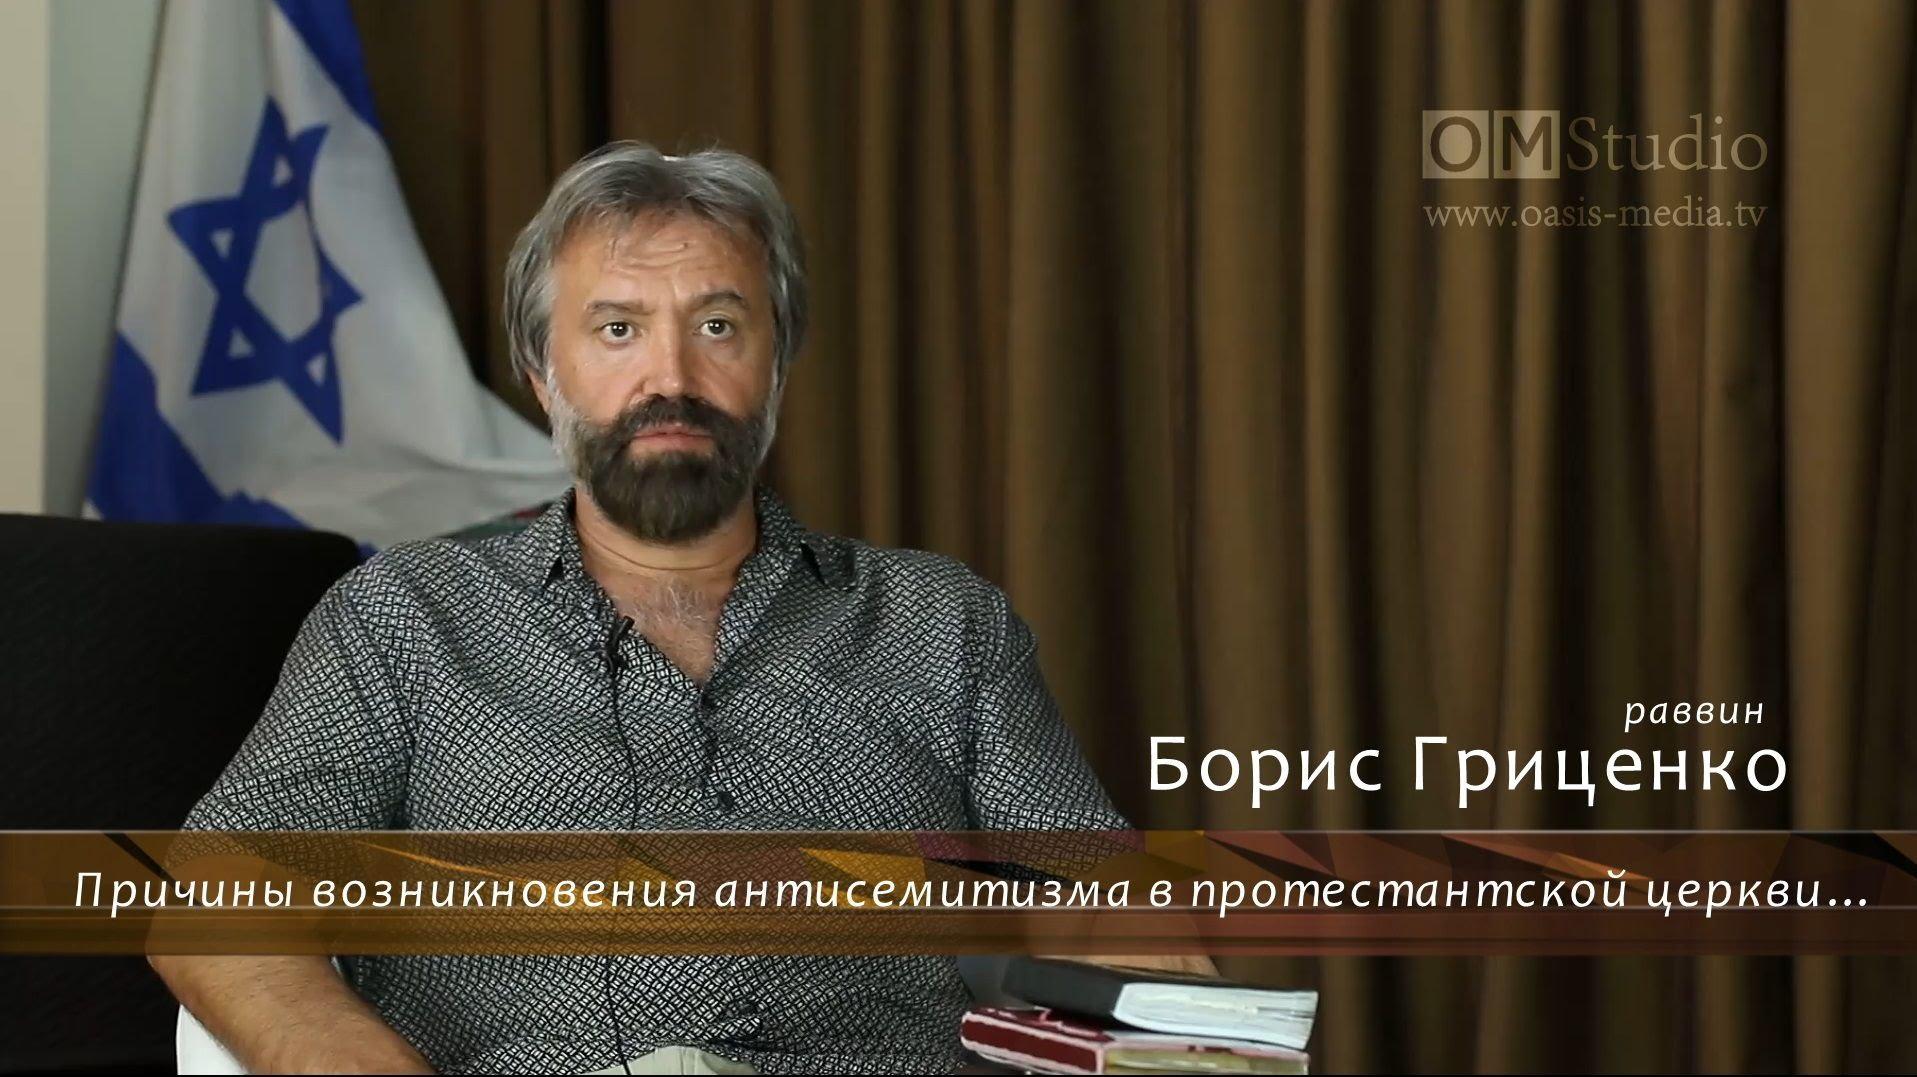 Борис Грисенко: Причины возникновения антисемитизма в протестантской церкви